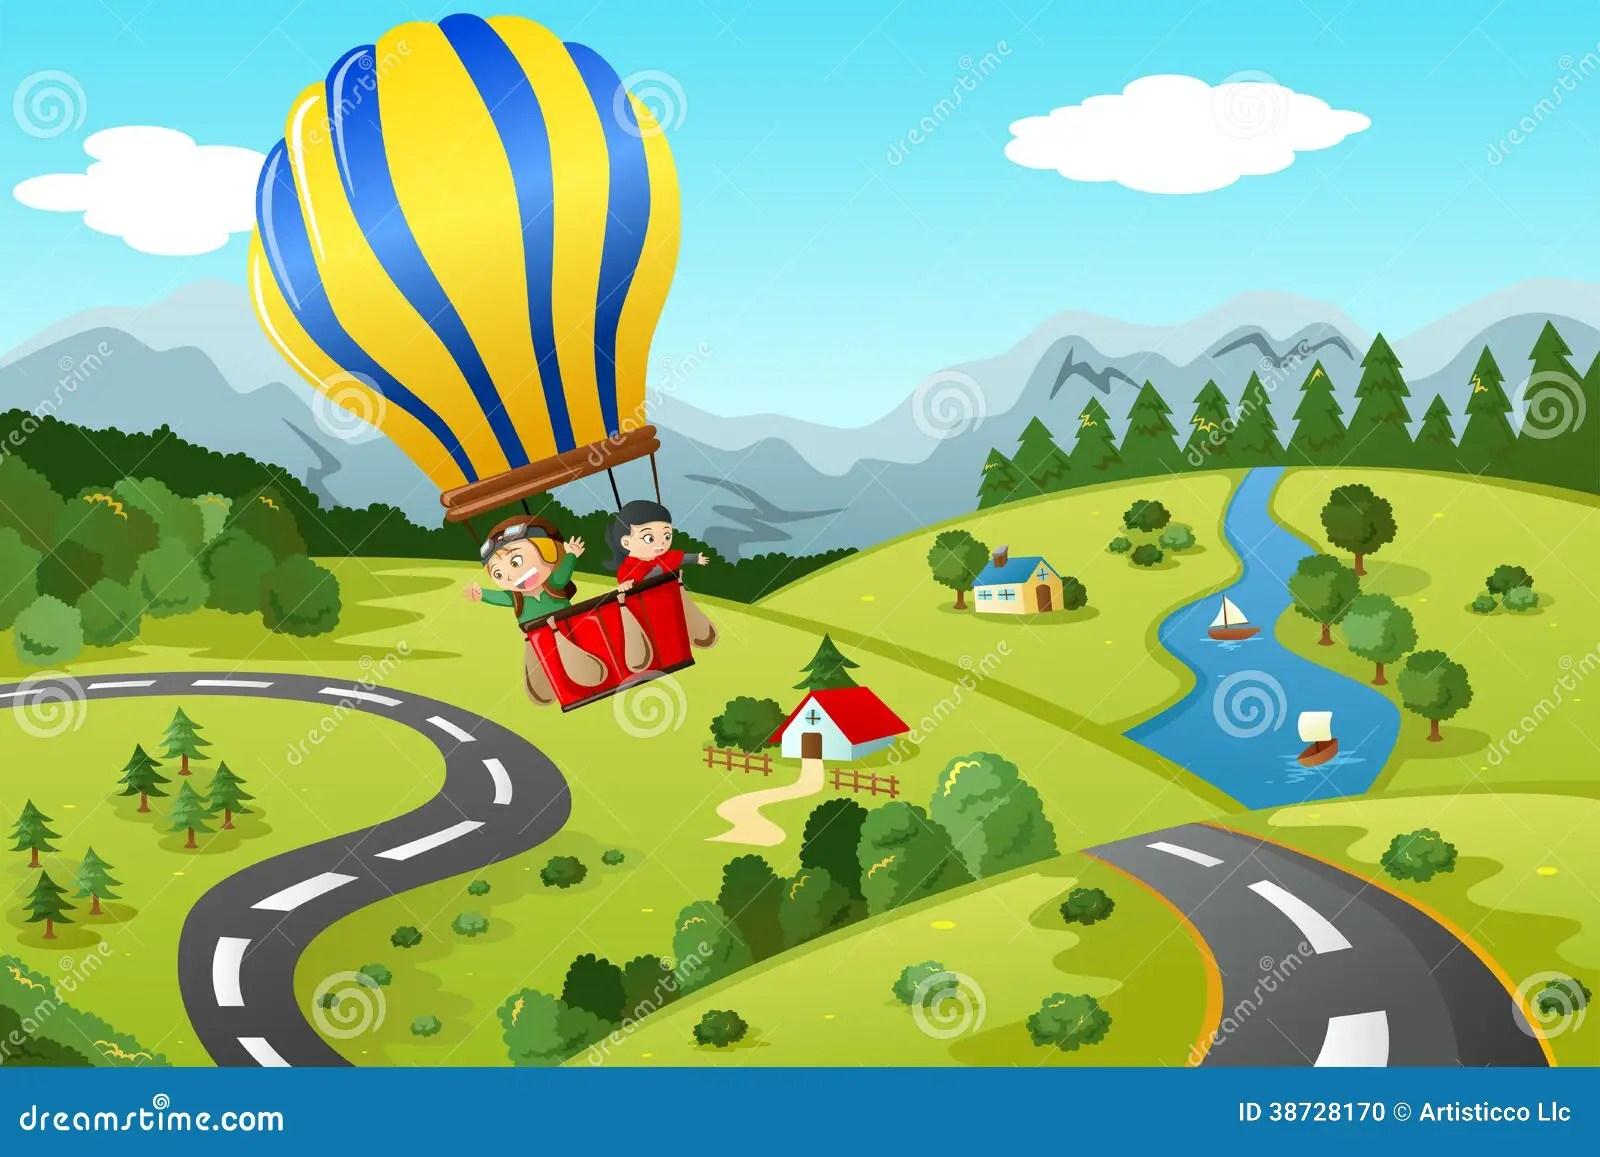 Kids Riding Hot Air Balloon Stock Photo